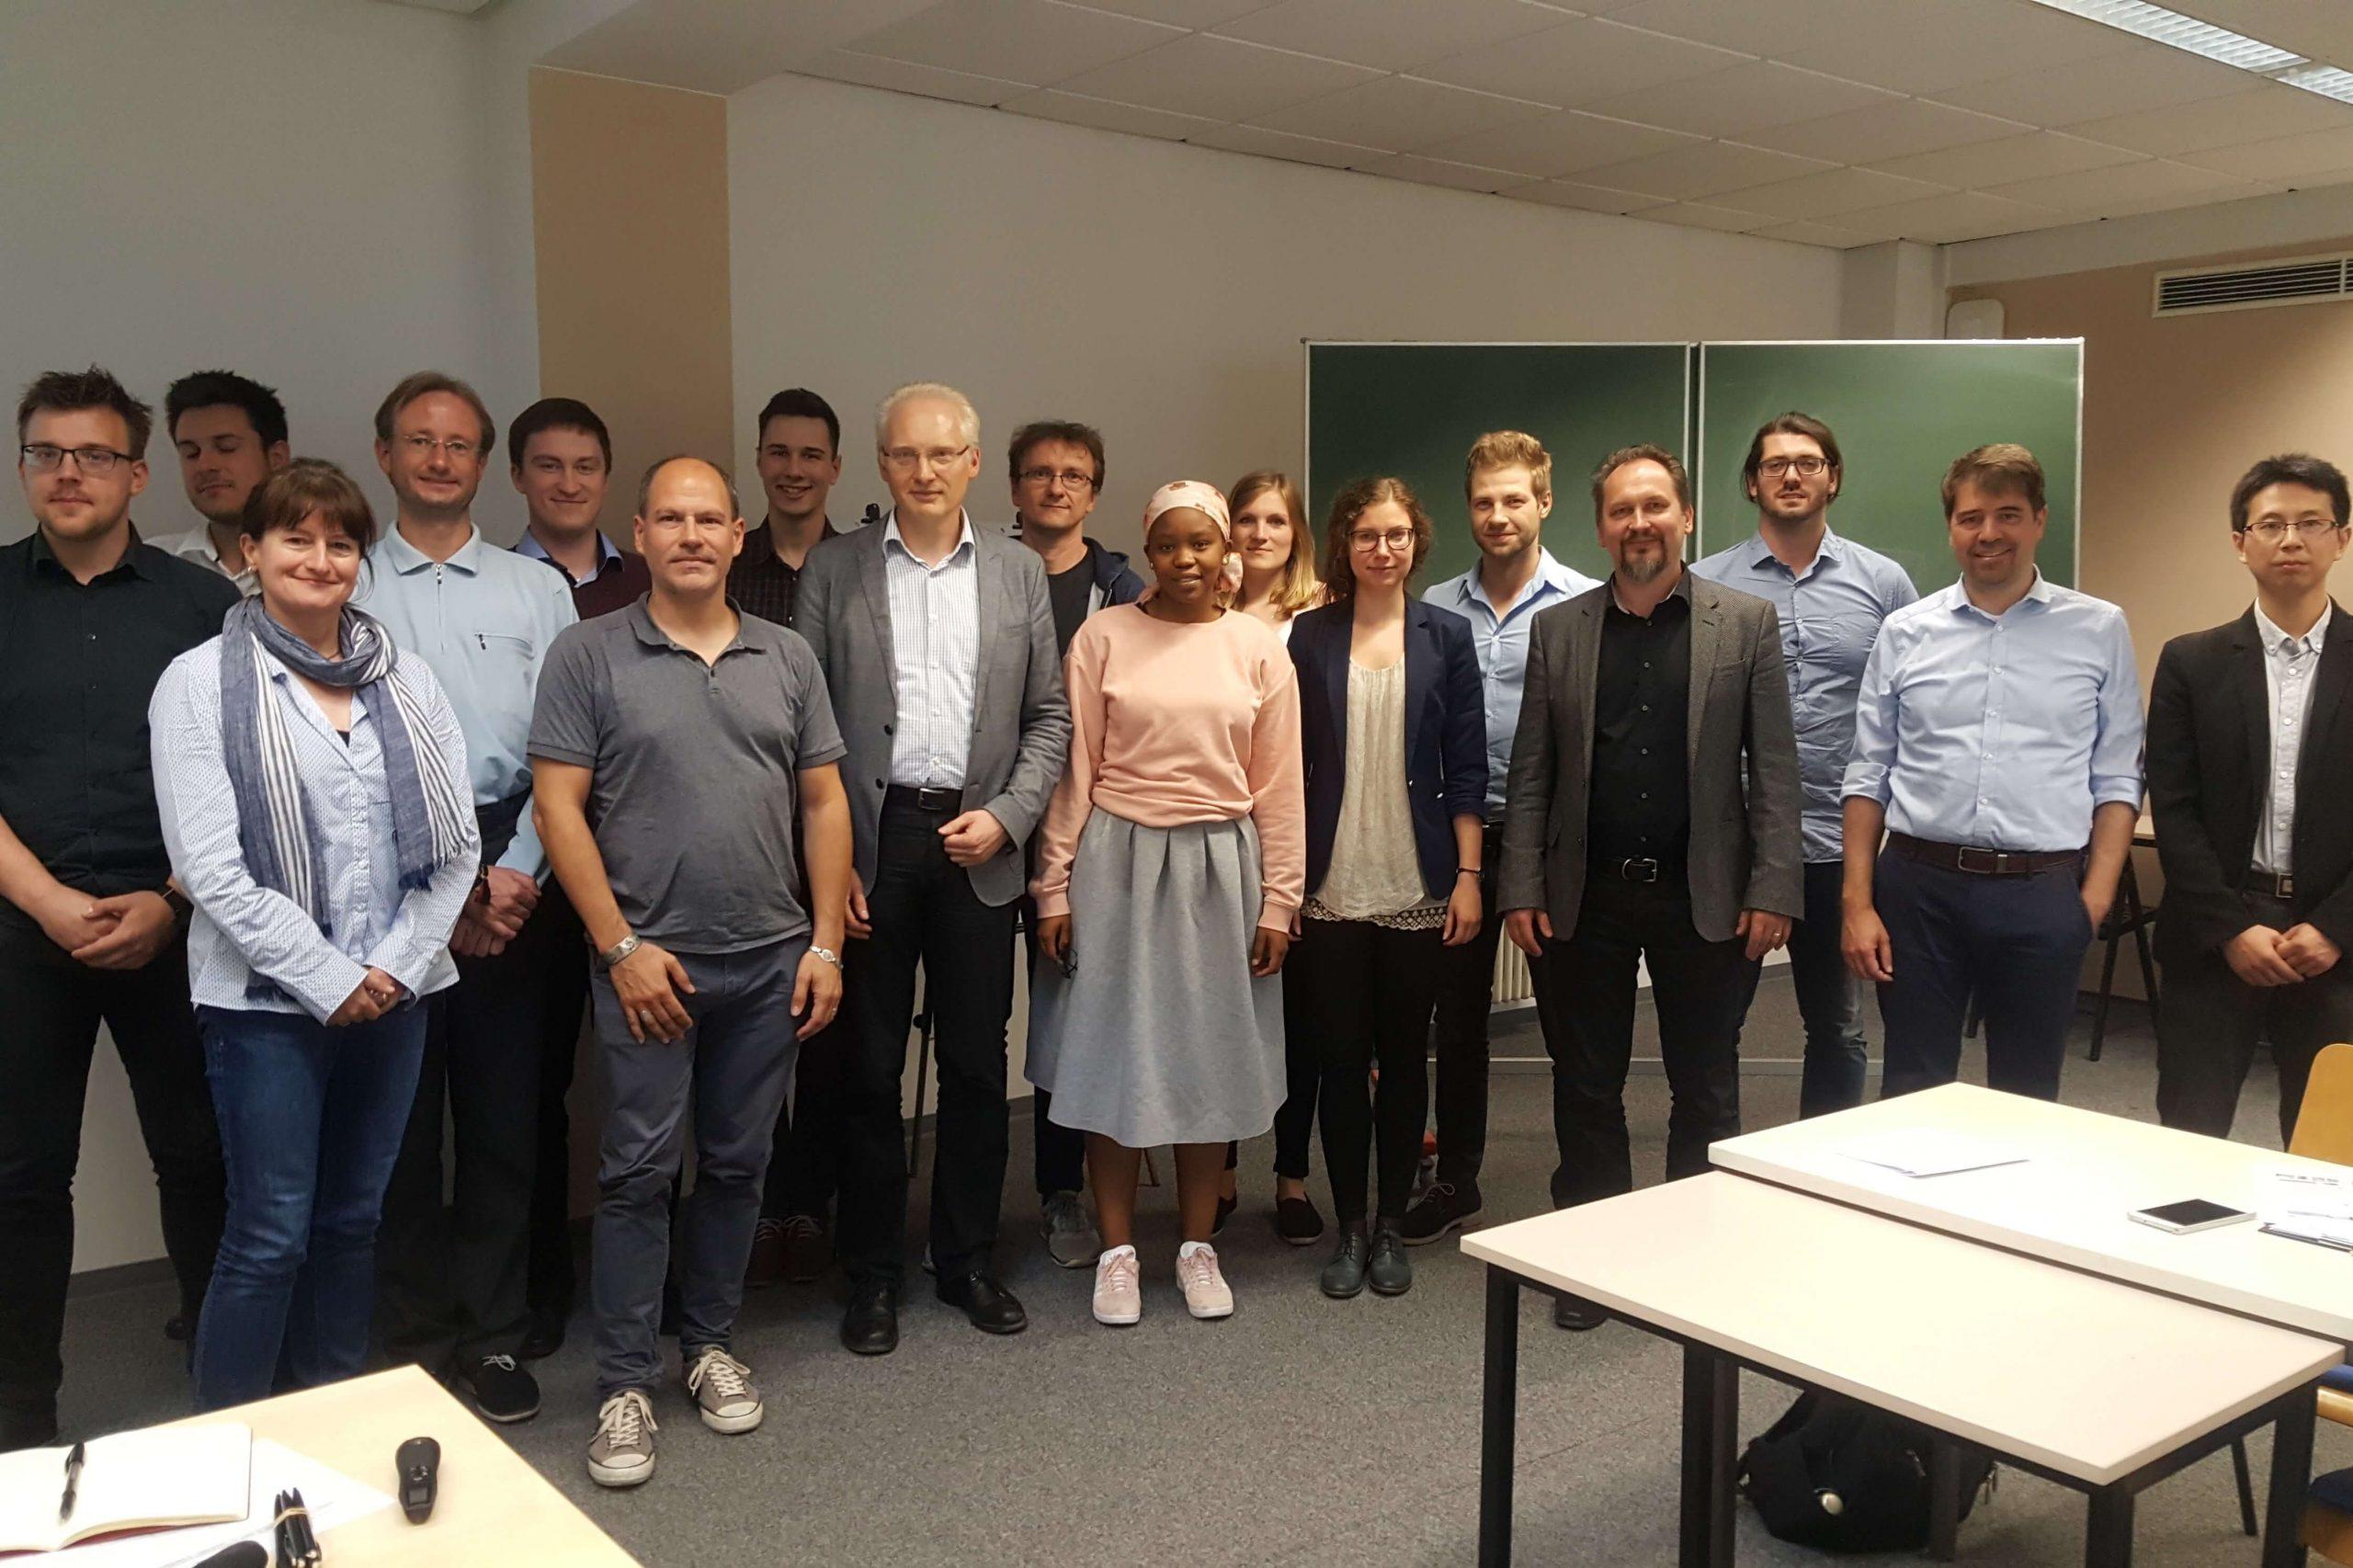 Analytic-Group, Berlin, 13.06.2018